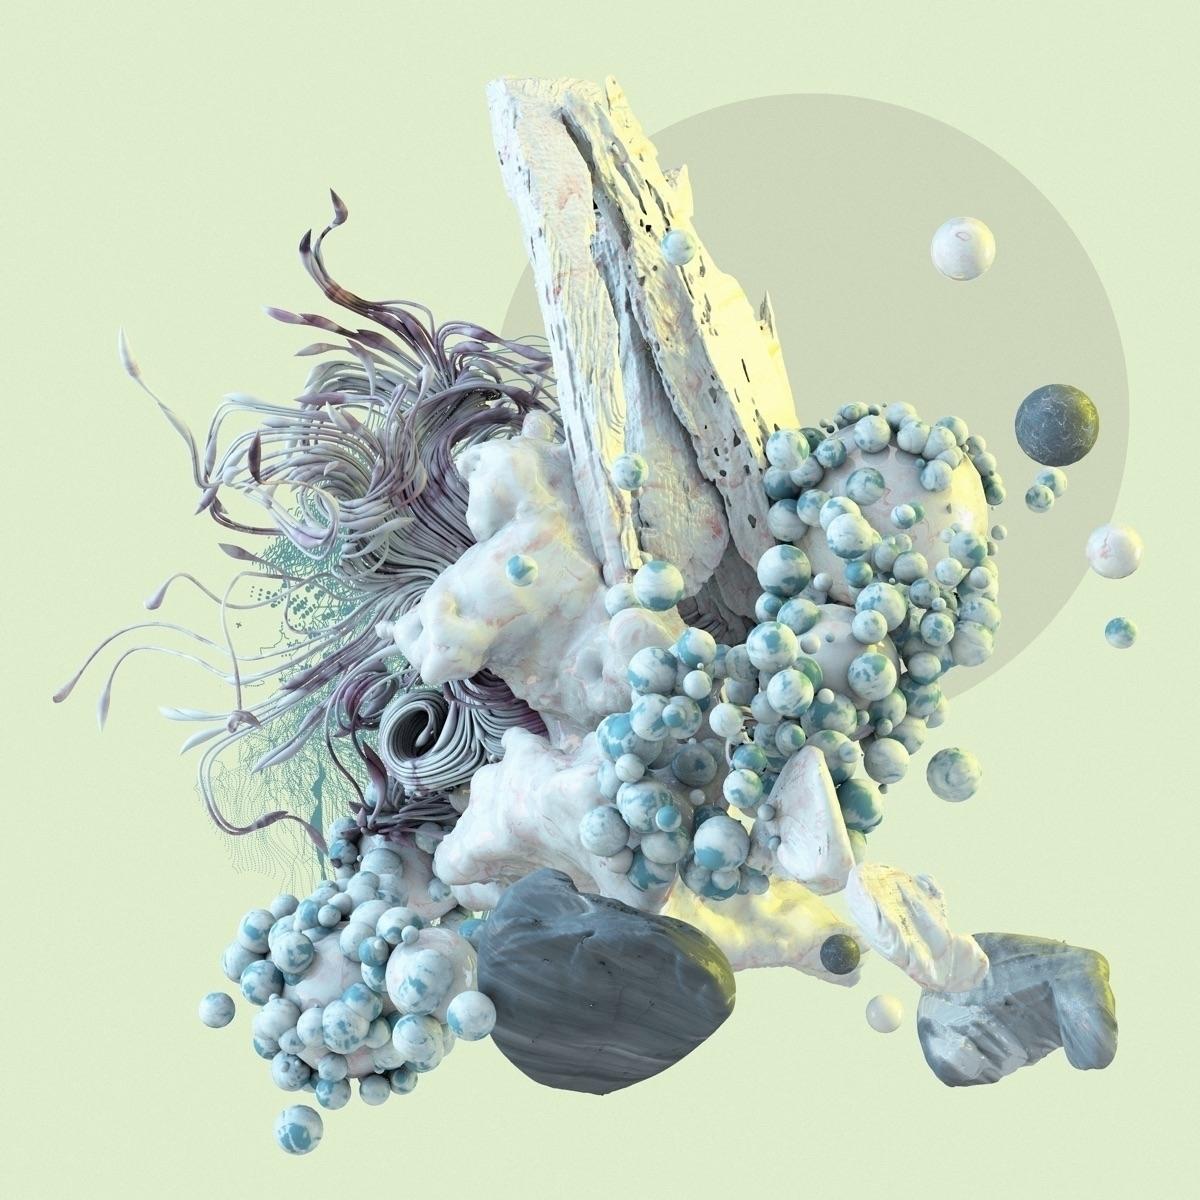 Crustacean mimicry Neil Dart - C4D - anthonyneildart | ello